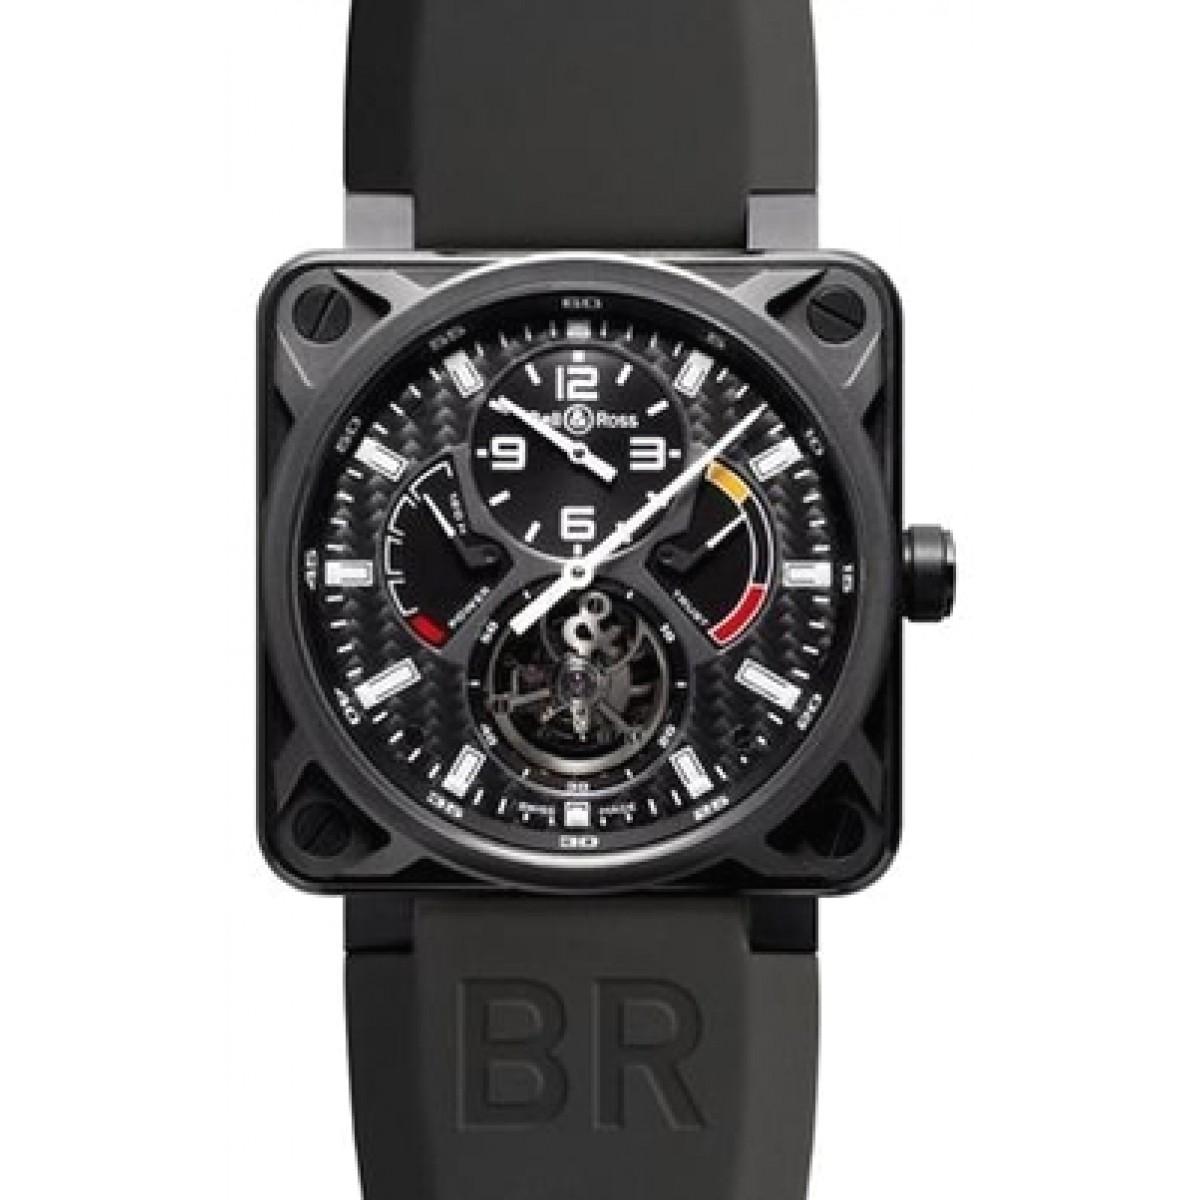 d128a04c243 Relógio Réplica Bell   Ross BR 01 Tourbillon